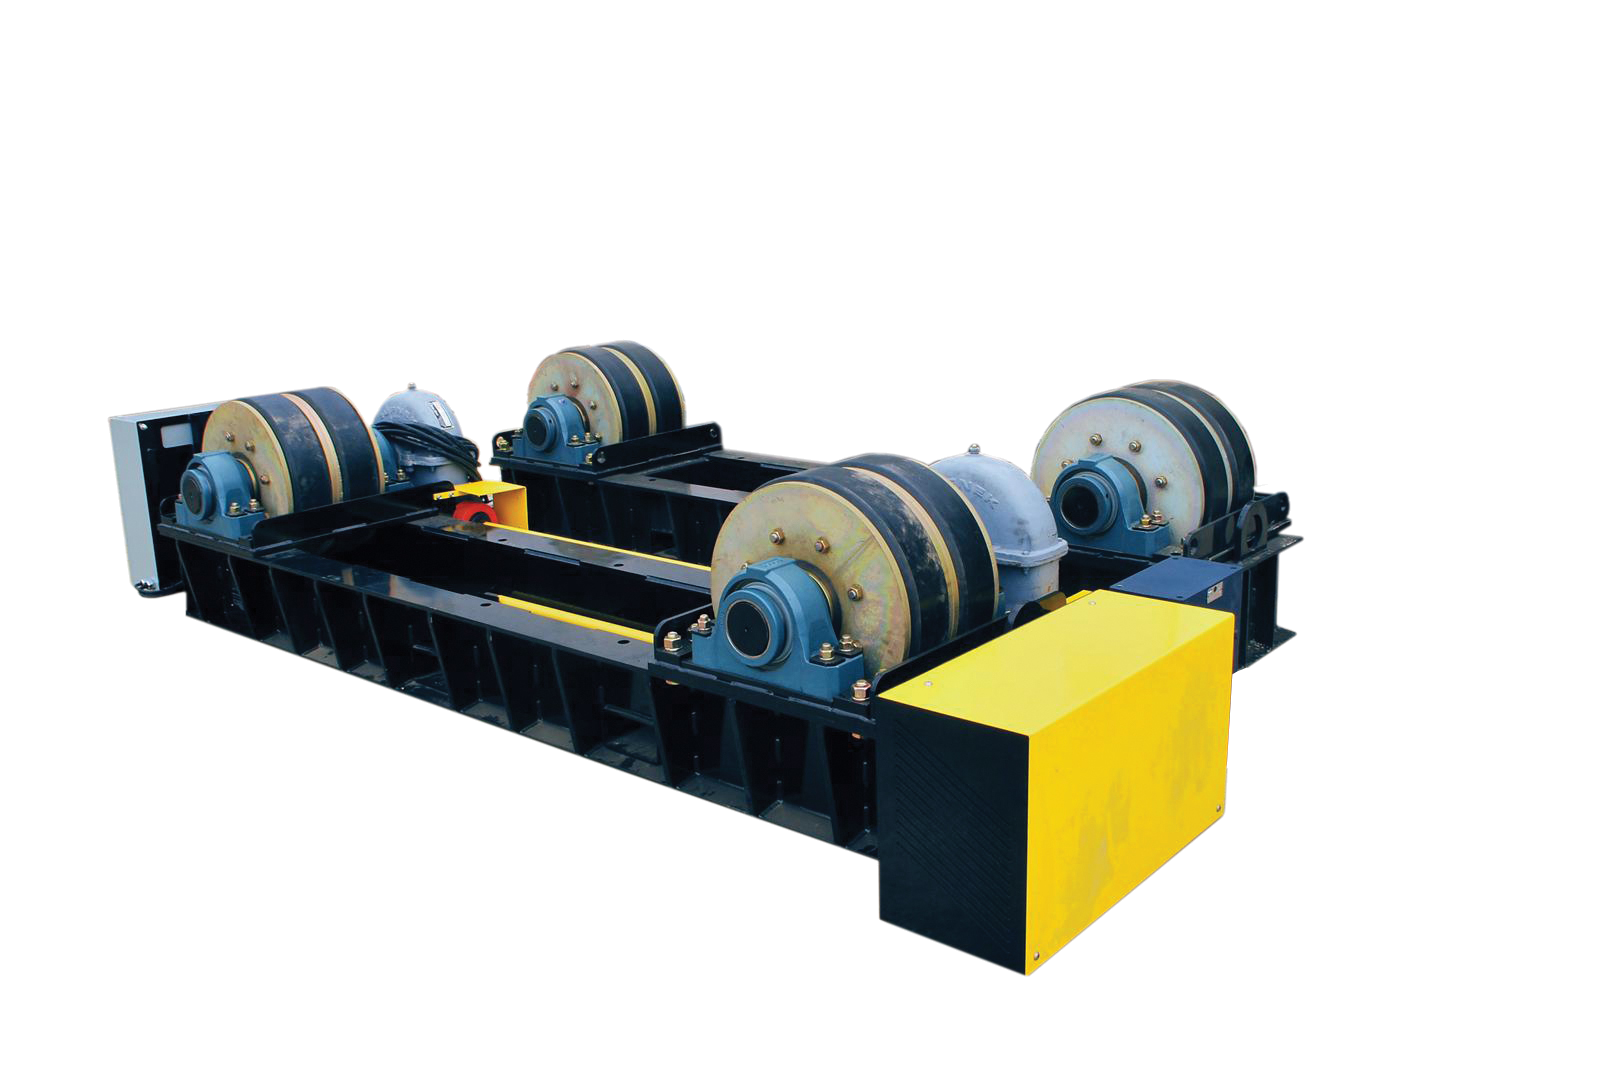 120 ton capacity tank rollers